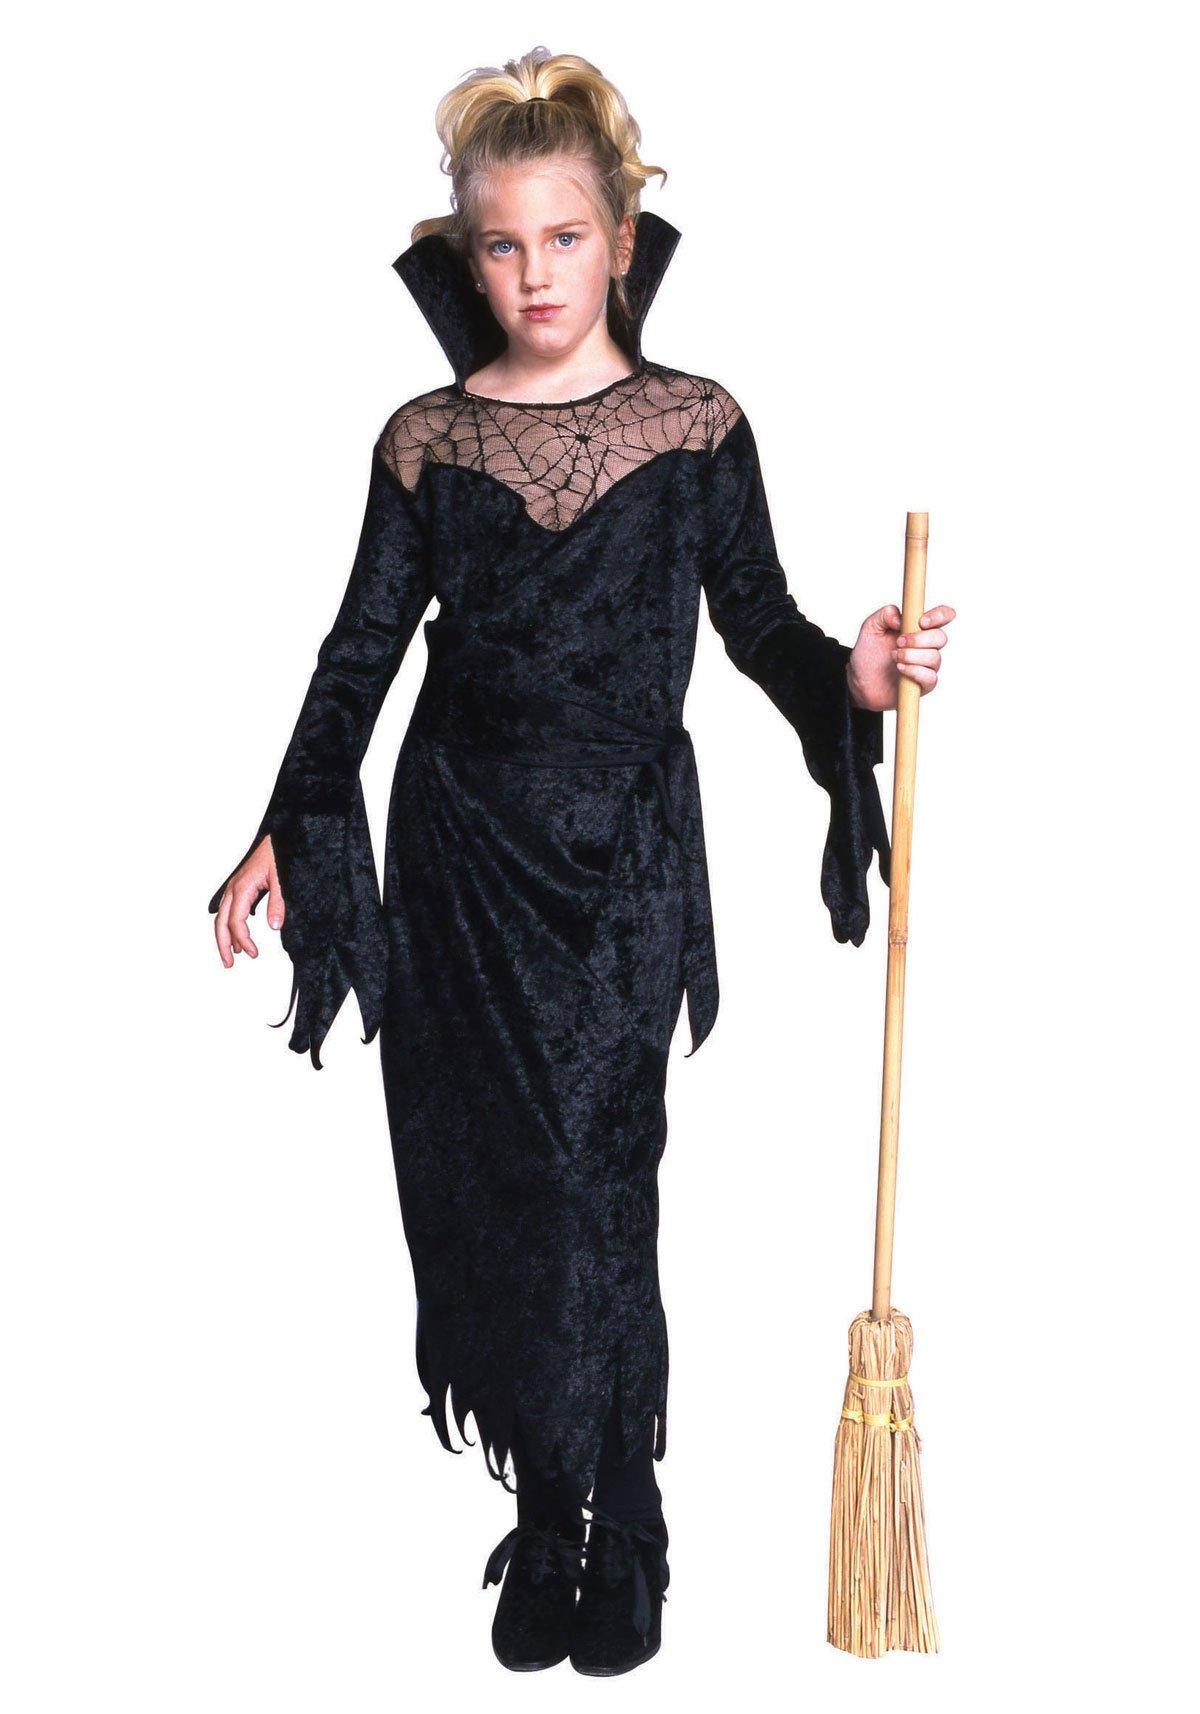 - 71DRjb2An3L - Enchanting Witch Child Costume